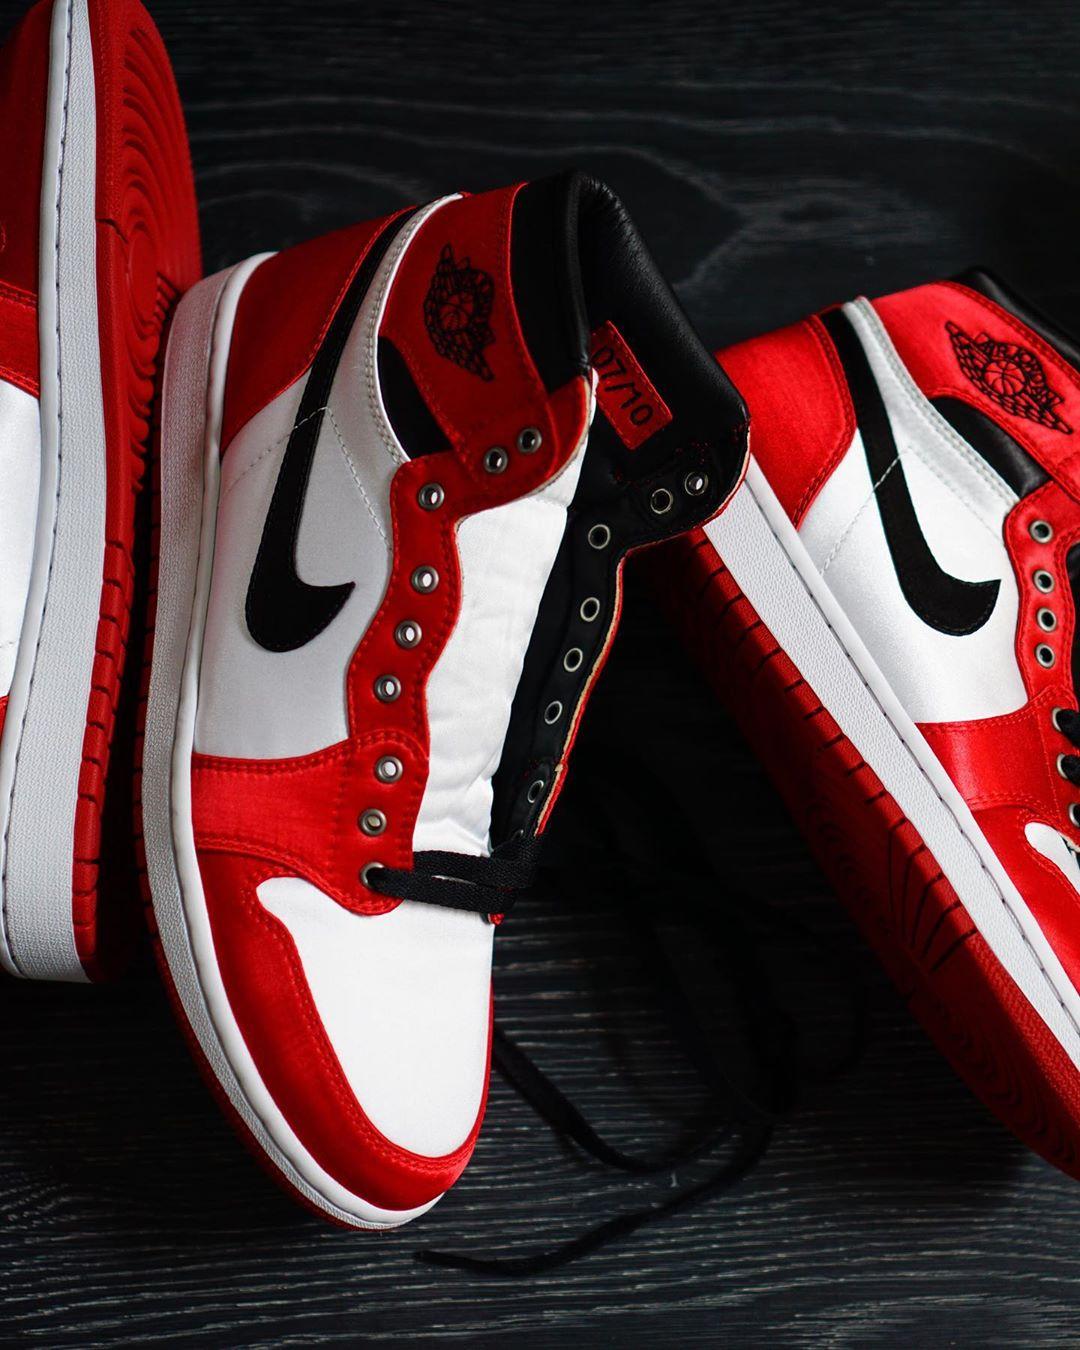 hoopfr3sh,AJ1,SATIN  全球限量 10 套的丝绸 Air Jordan 1!万元发售价,上架秒售罄!